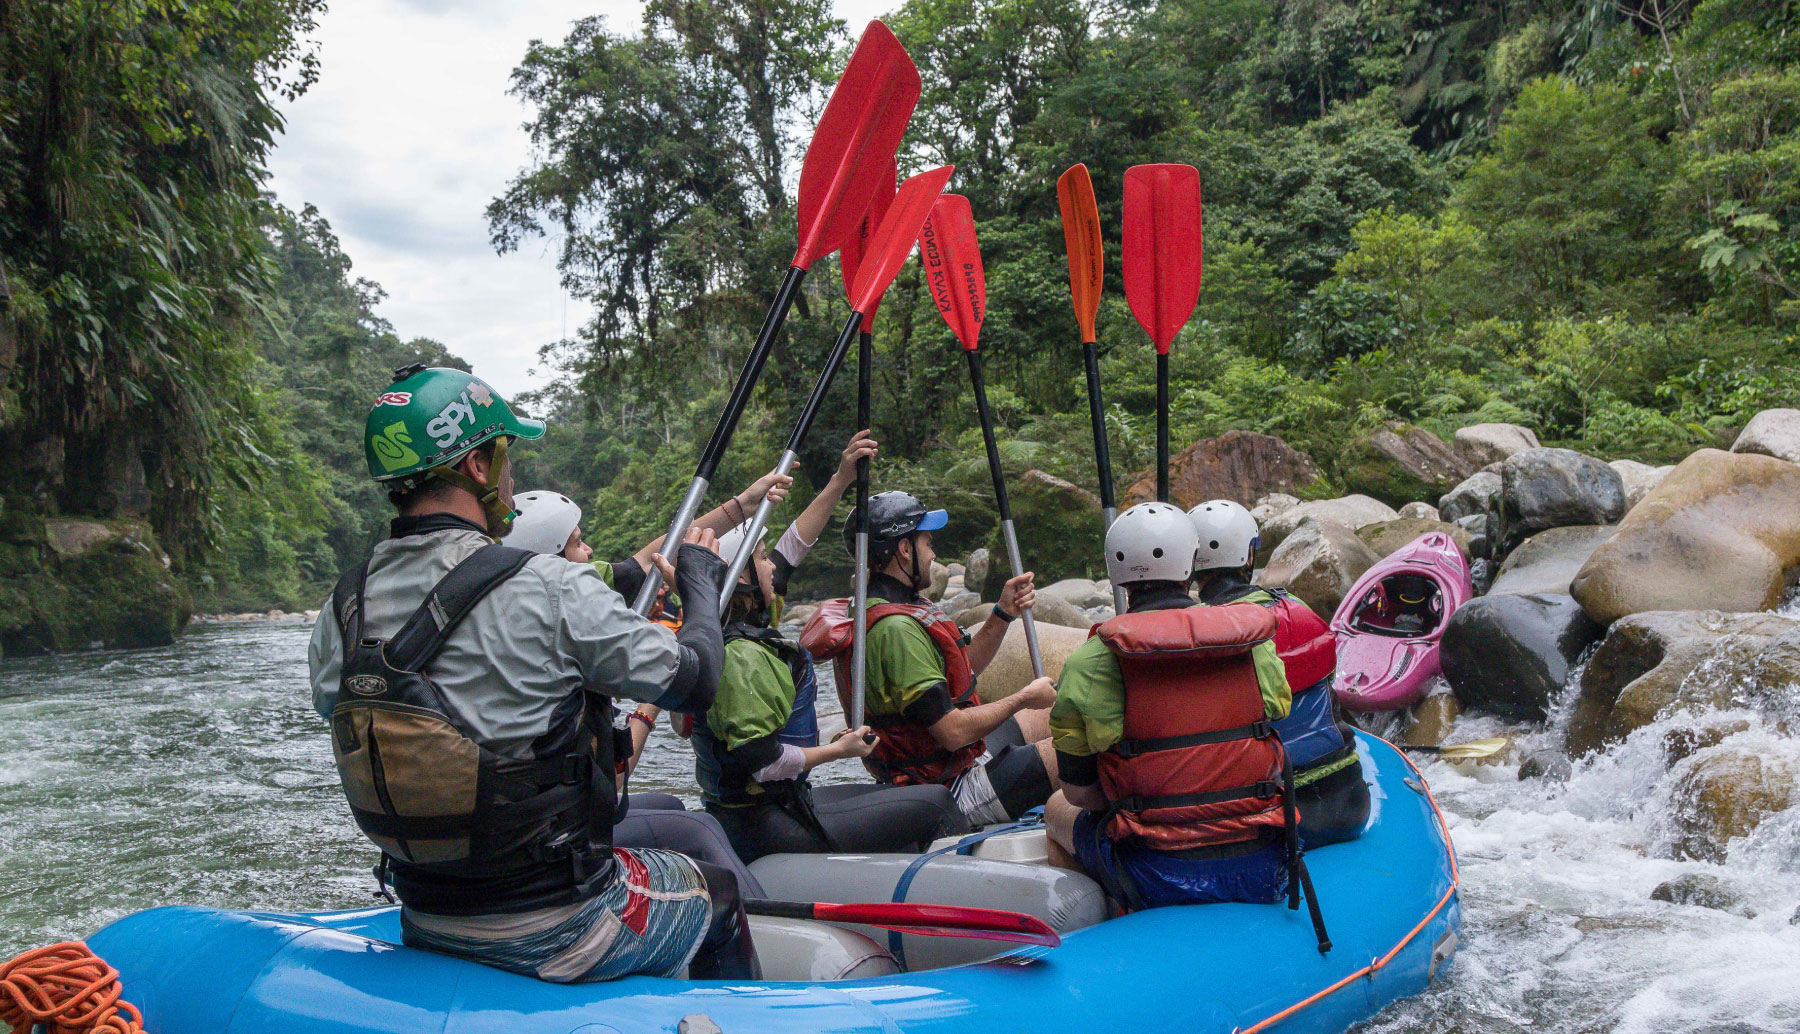 Celebration after running one of many rapids on the Jondachi river. Rafting Class IV Jondachi | Hollin rivers